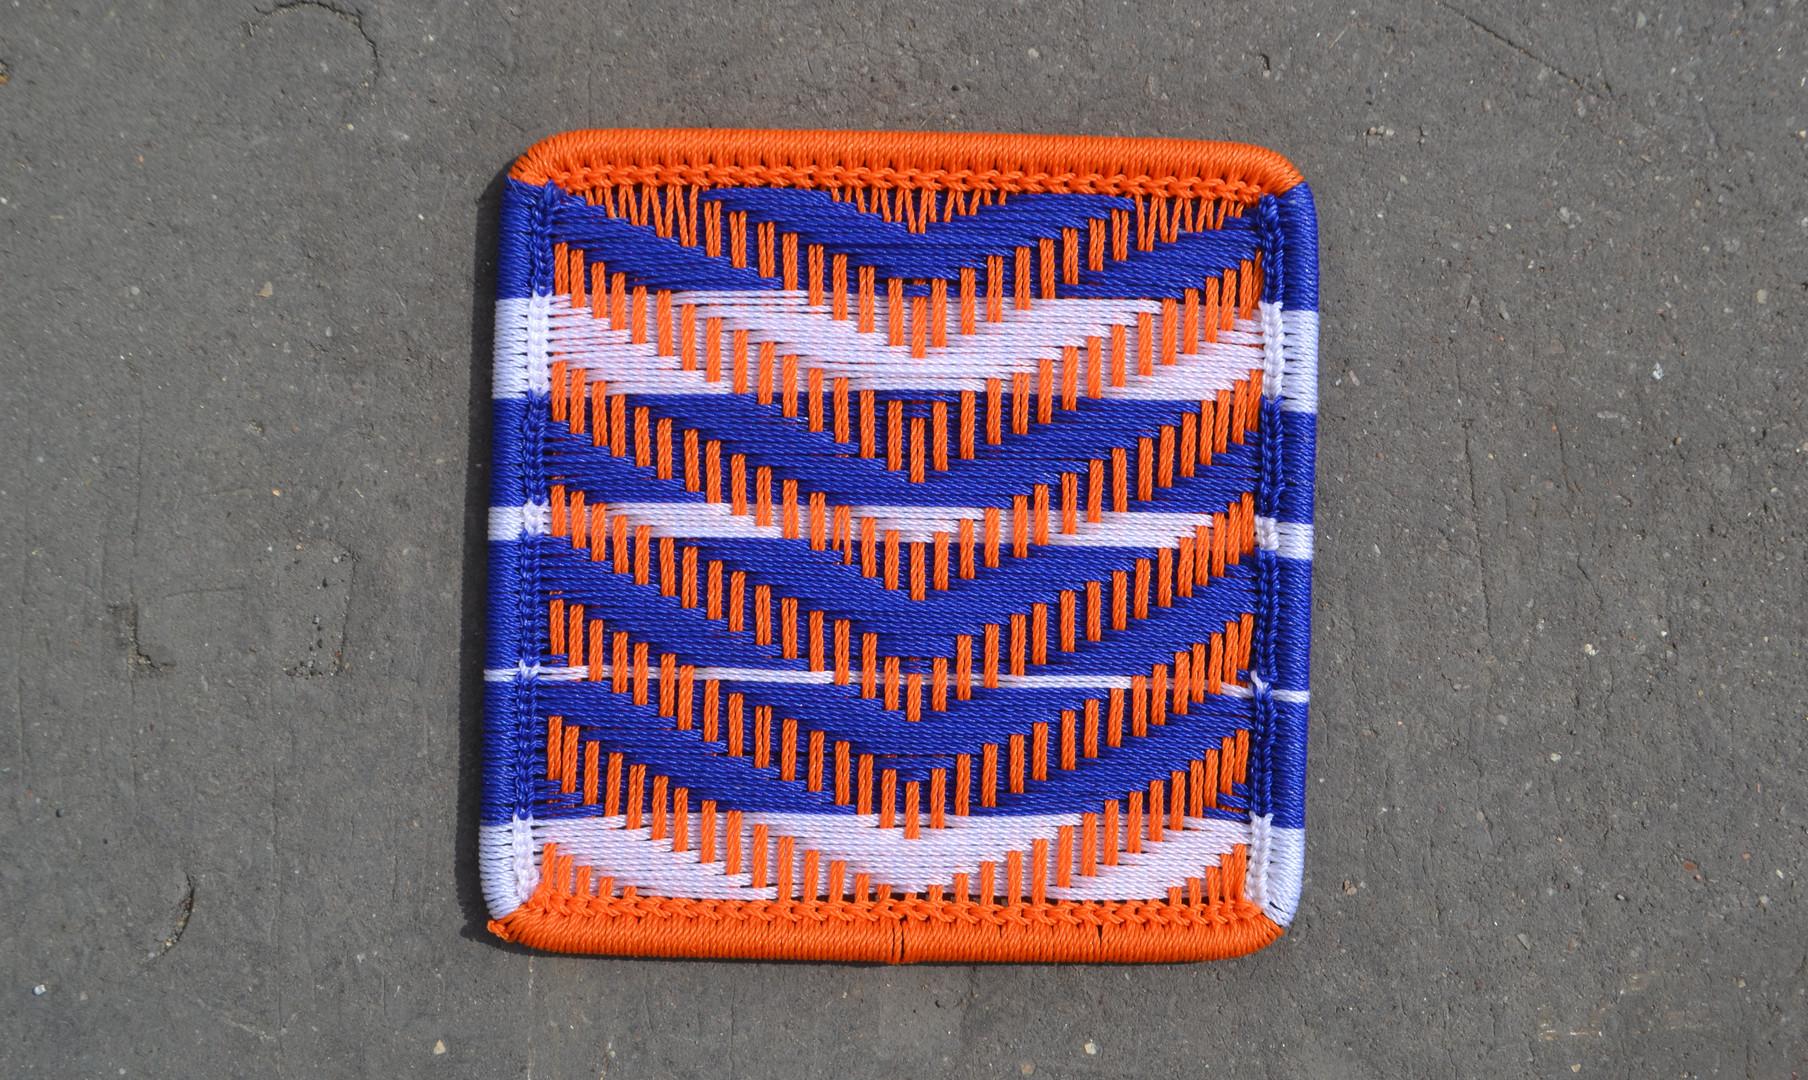 Orange / bleu / bandes blanches